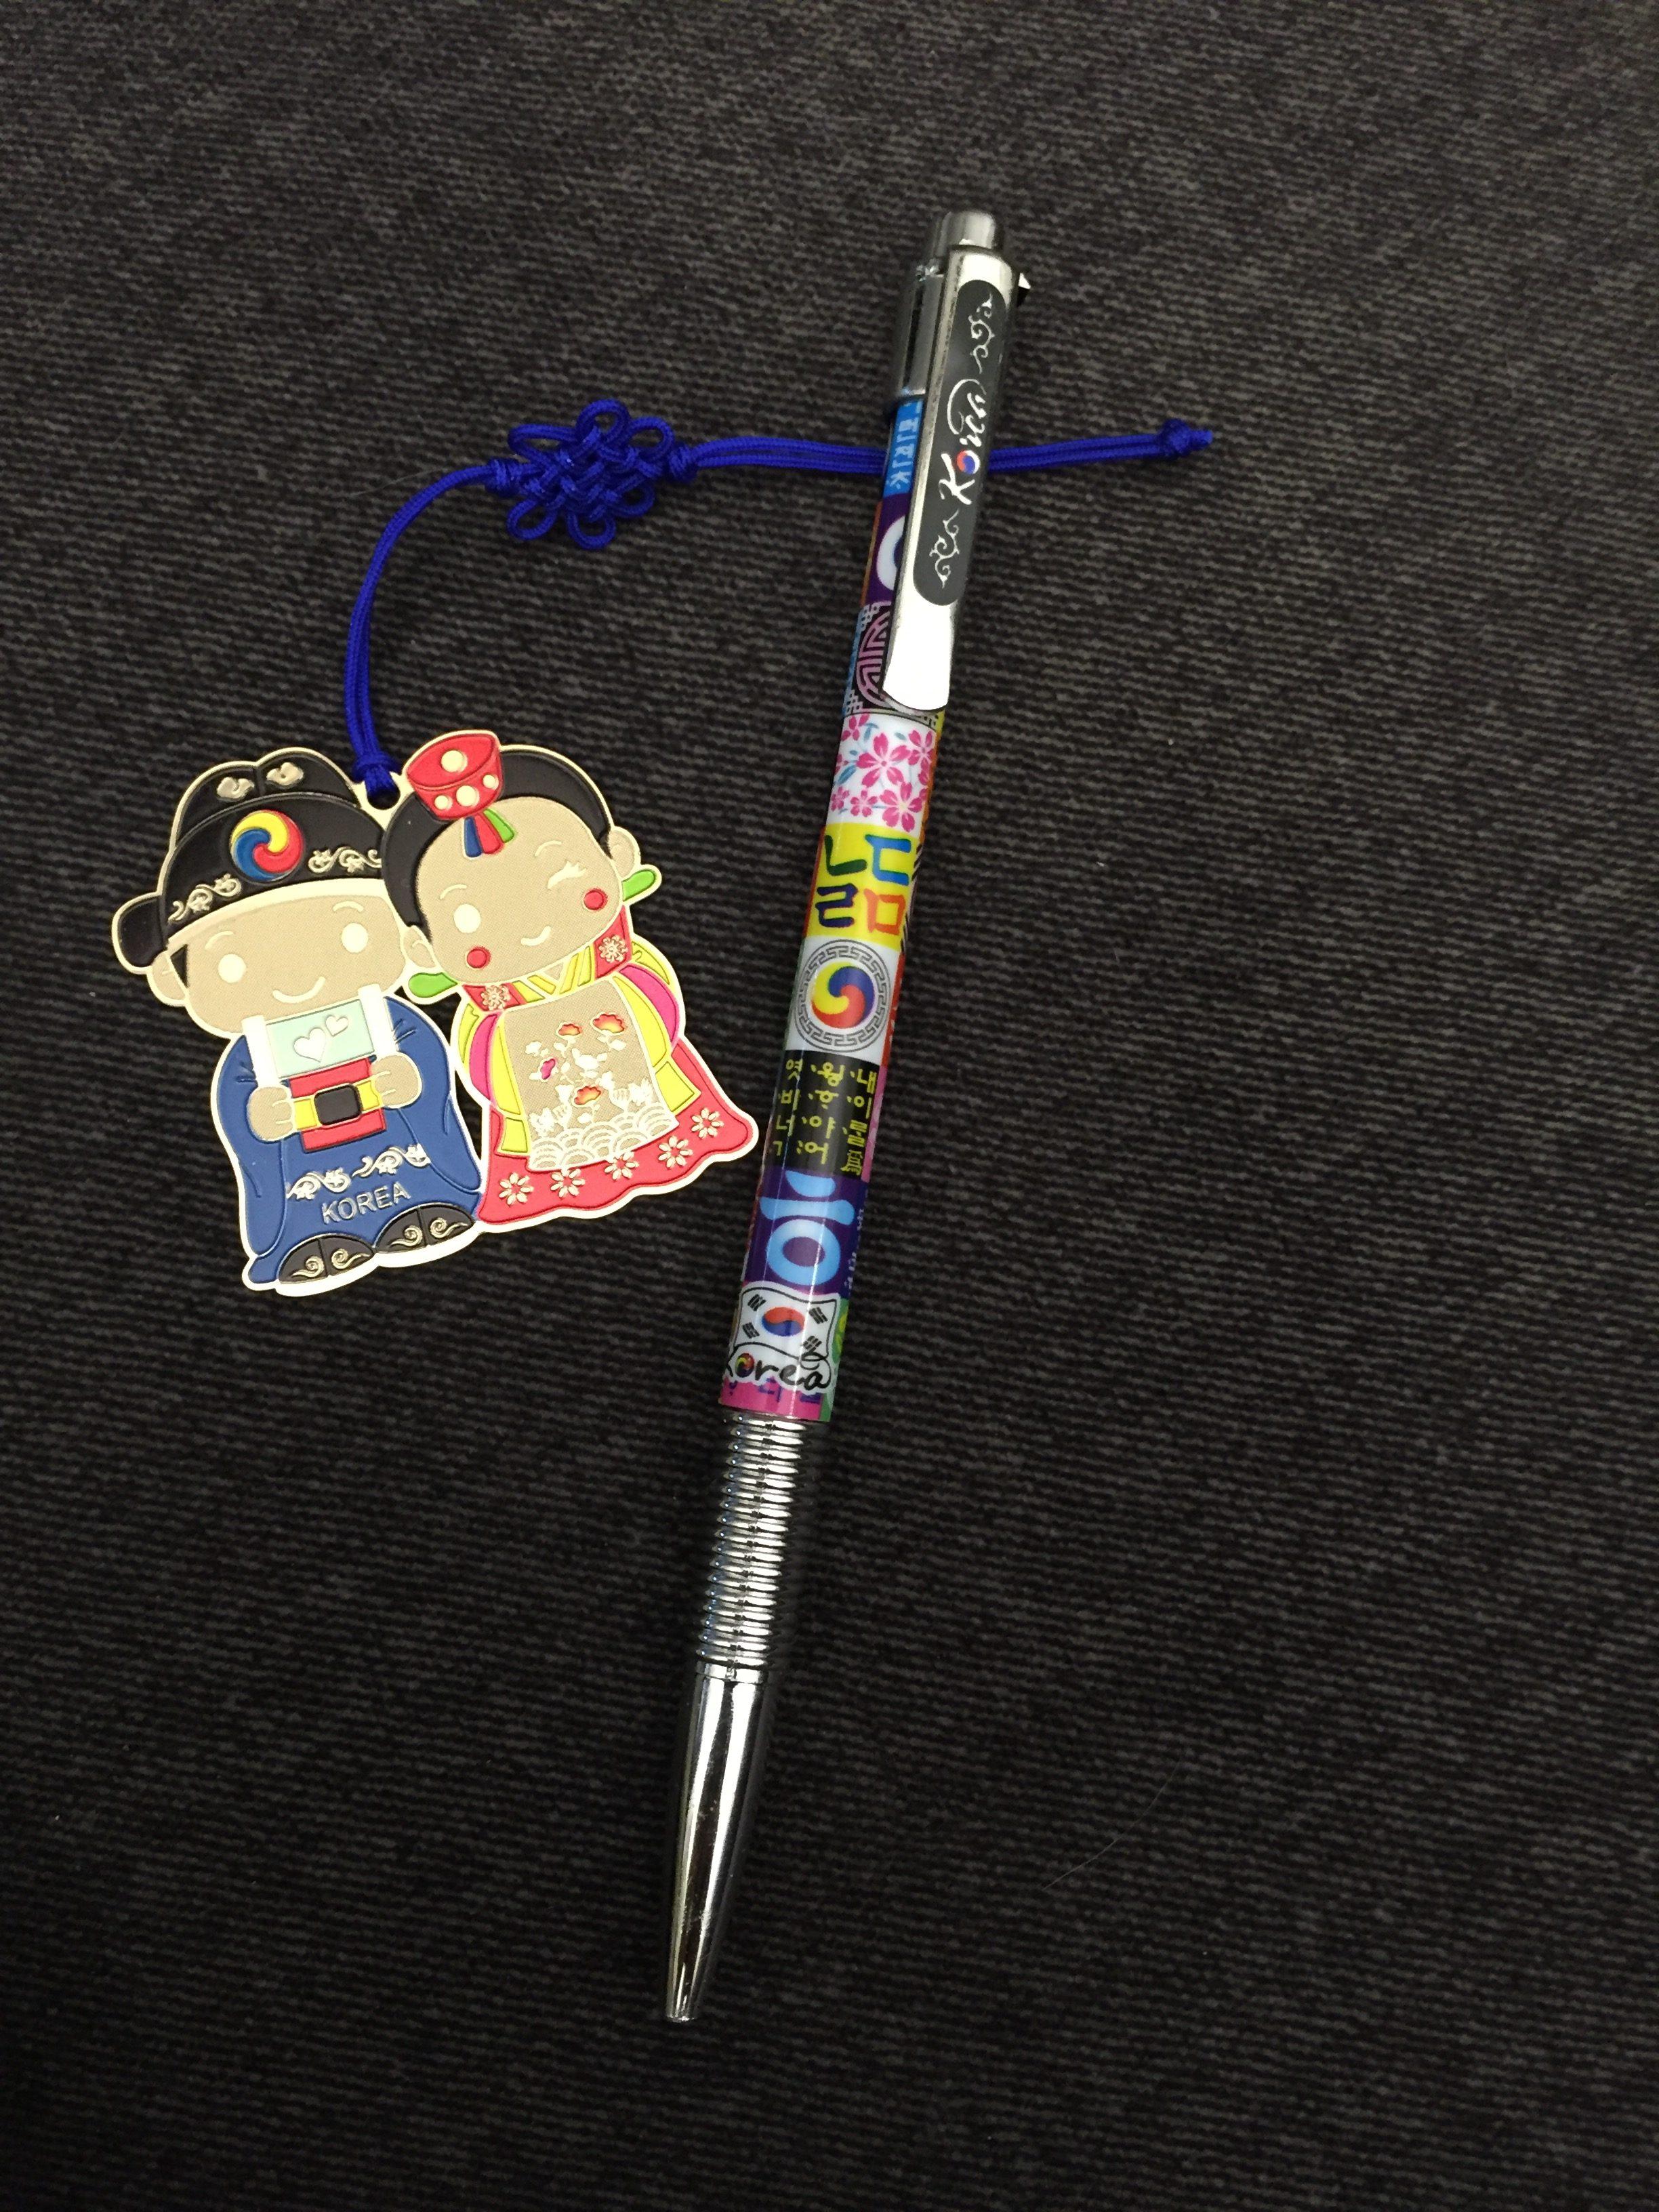 pen pencil review korean souvenir ballpoint pen and metal bookmark rhonda eudaly